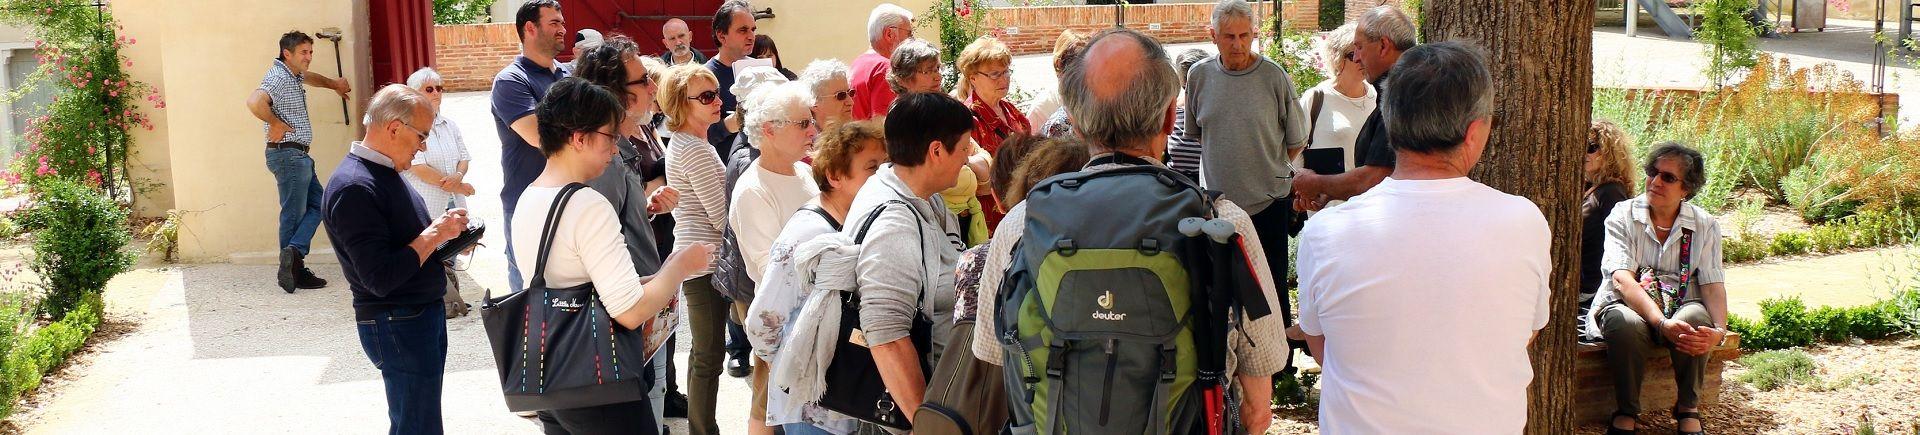 Groupes Moissac Occitanie Sud-Ouest